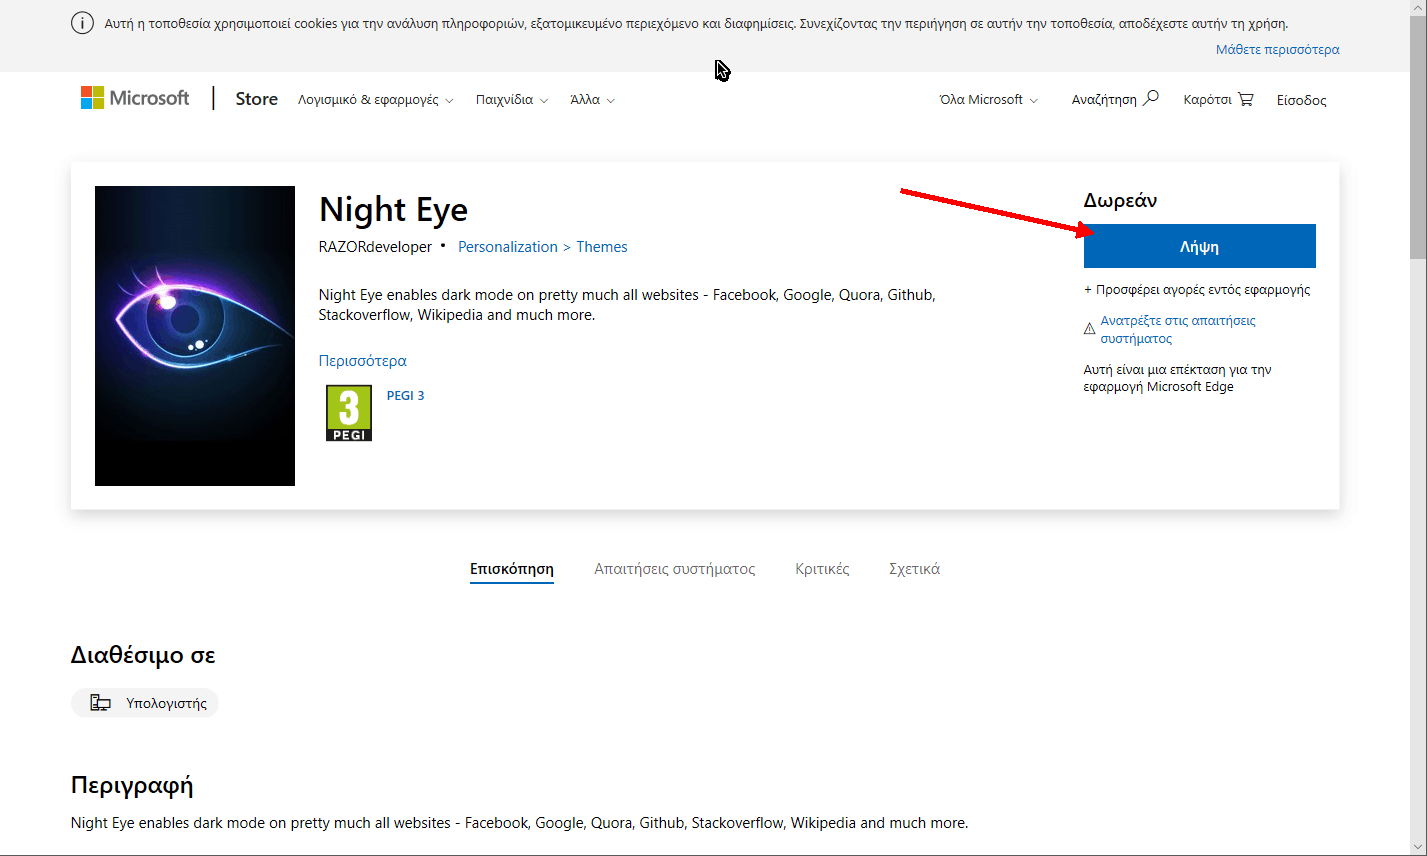 Dark Mode - Κάνε όλες τις ιστοσελίδες σε μαύρο χρώμα με το 'Night Eye'